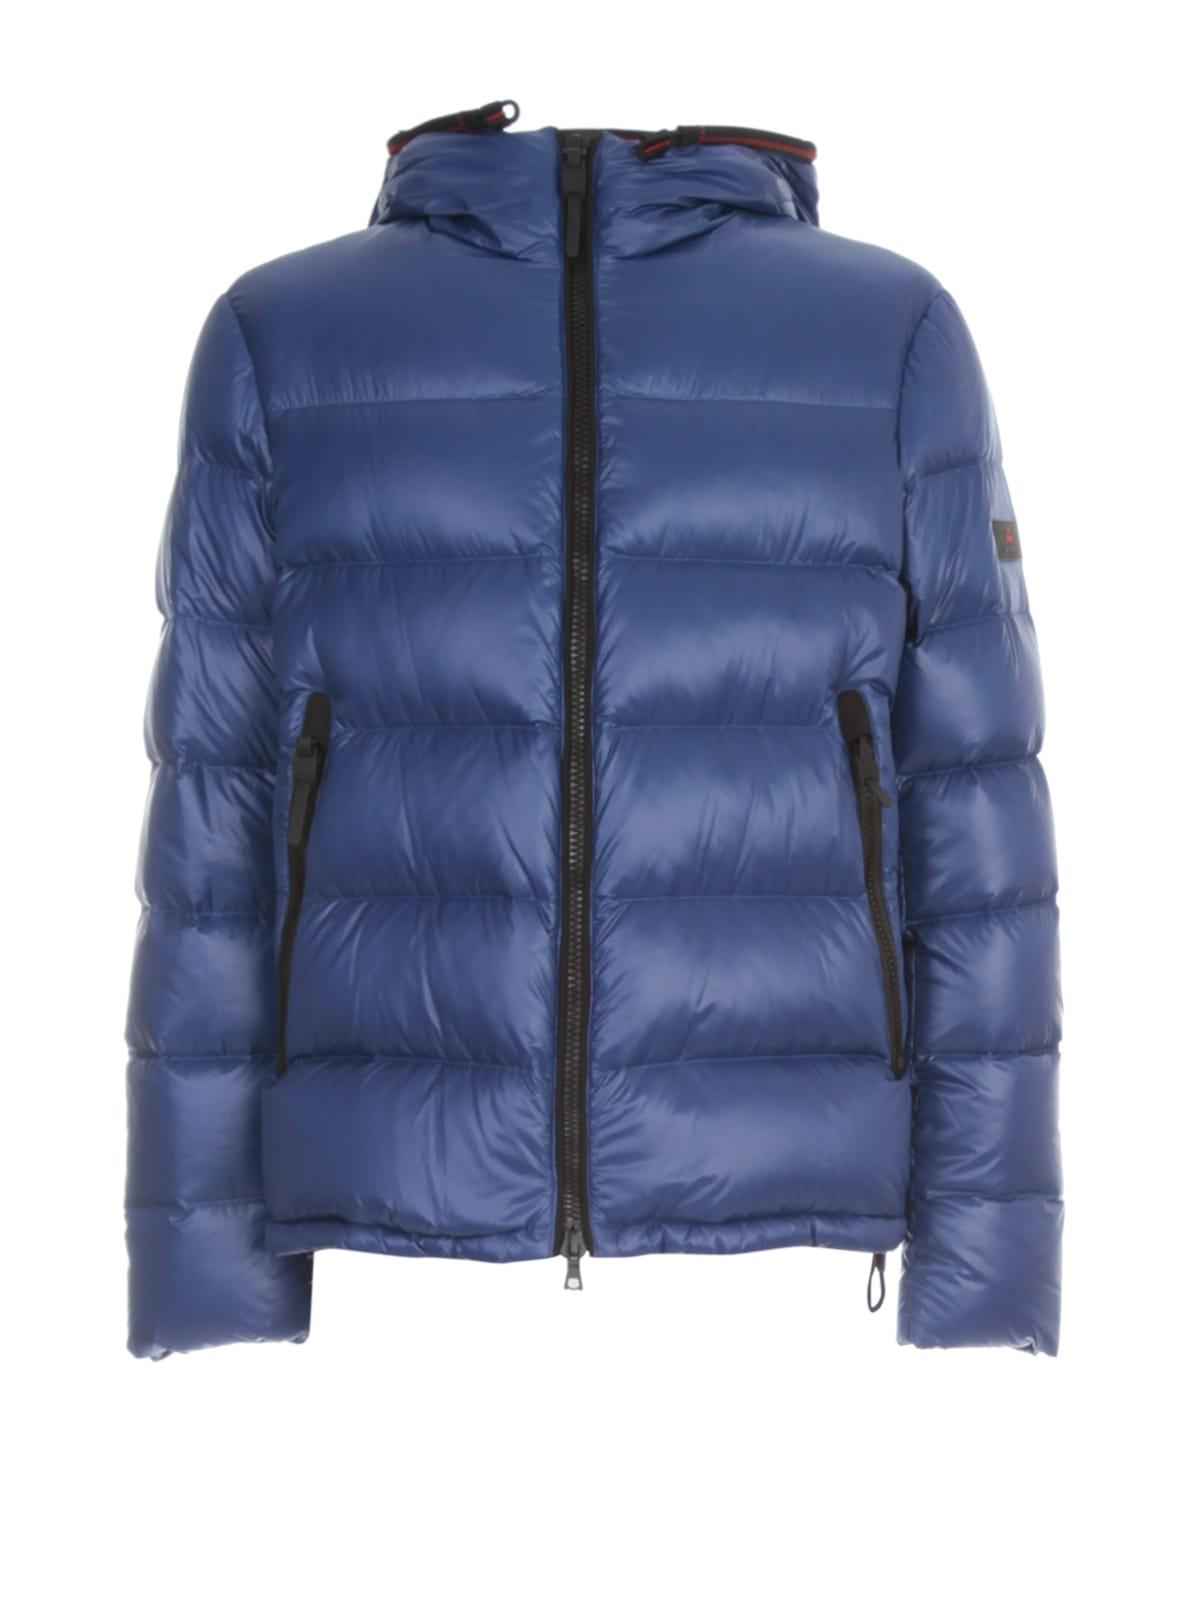 Peuterey Honova Feather Down Jacket W/ Hood